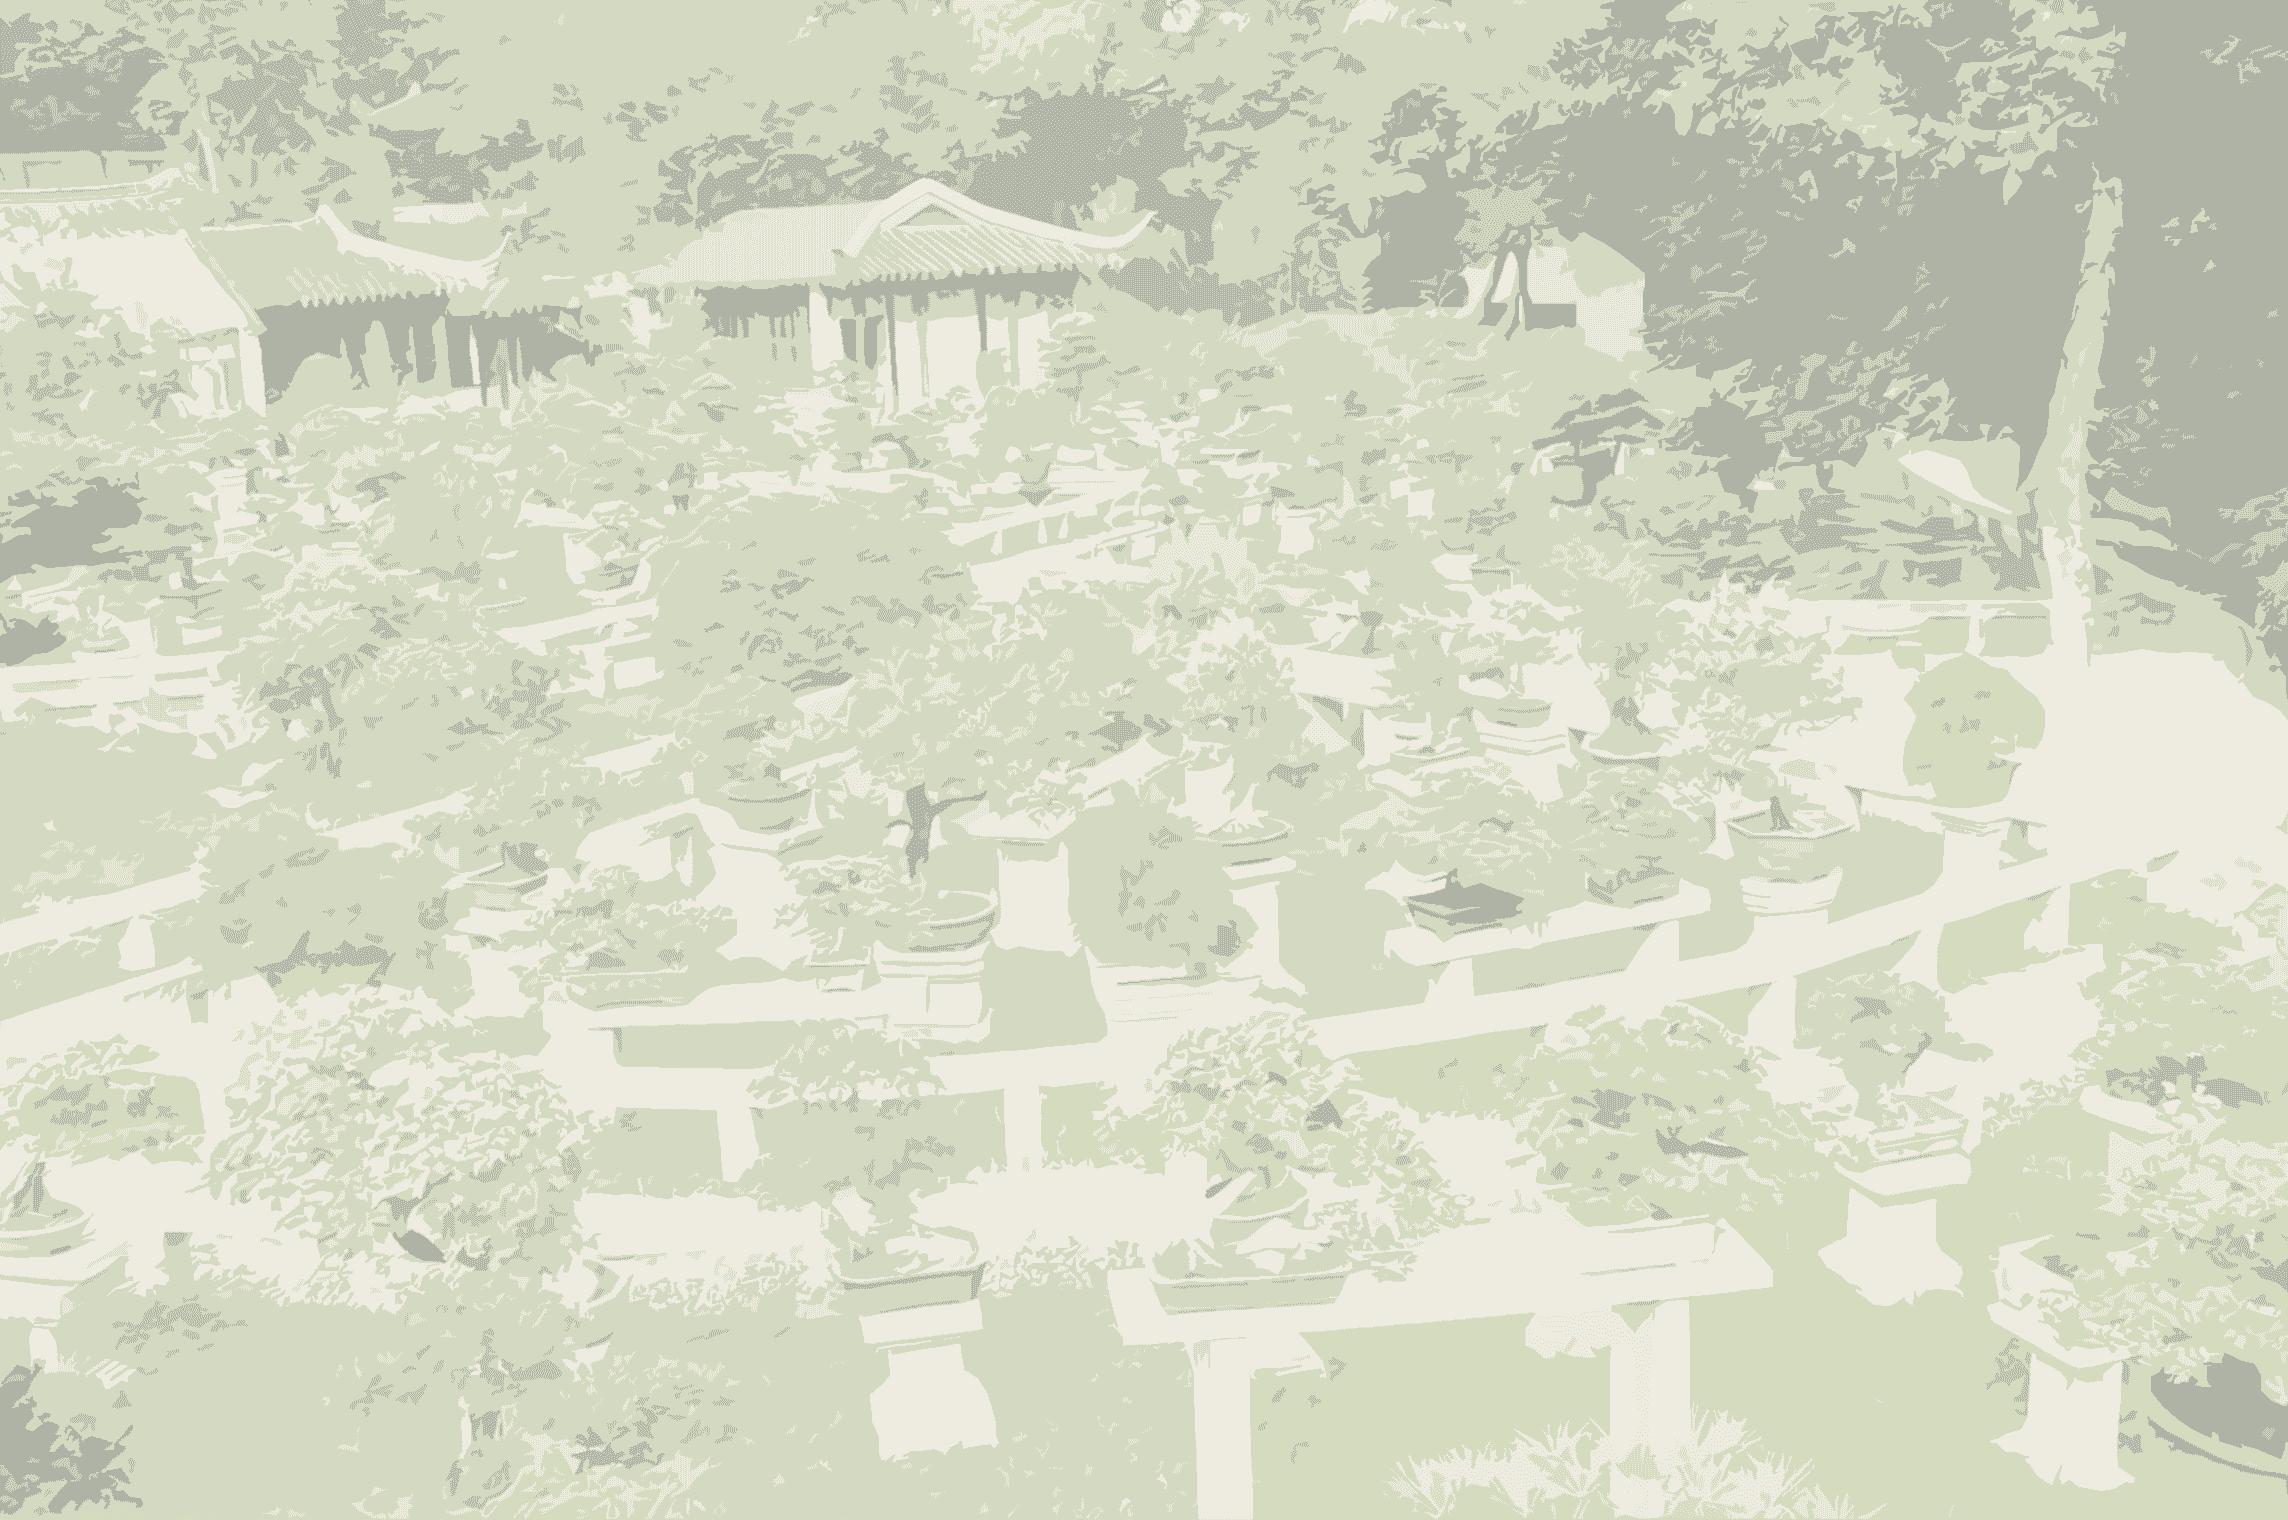 bonsai garden background